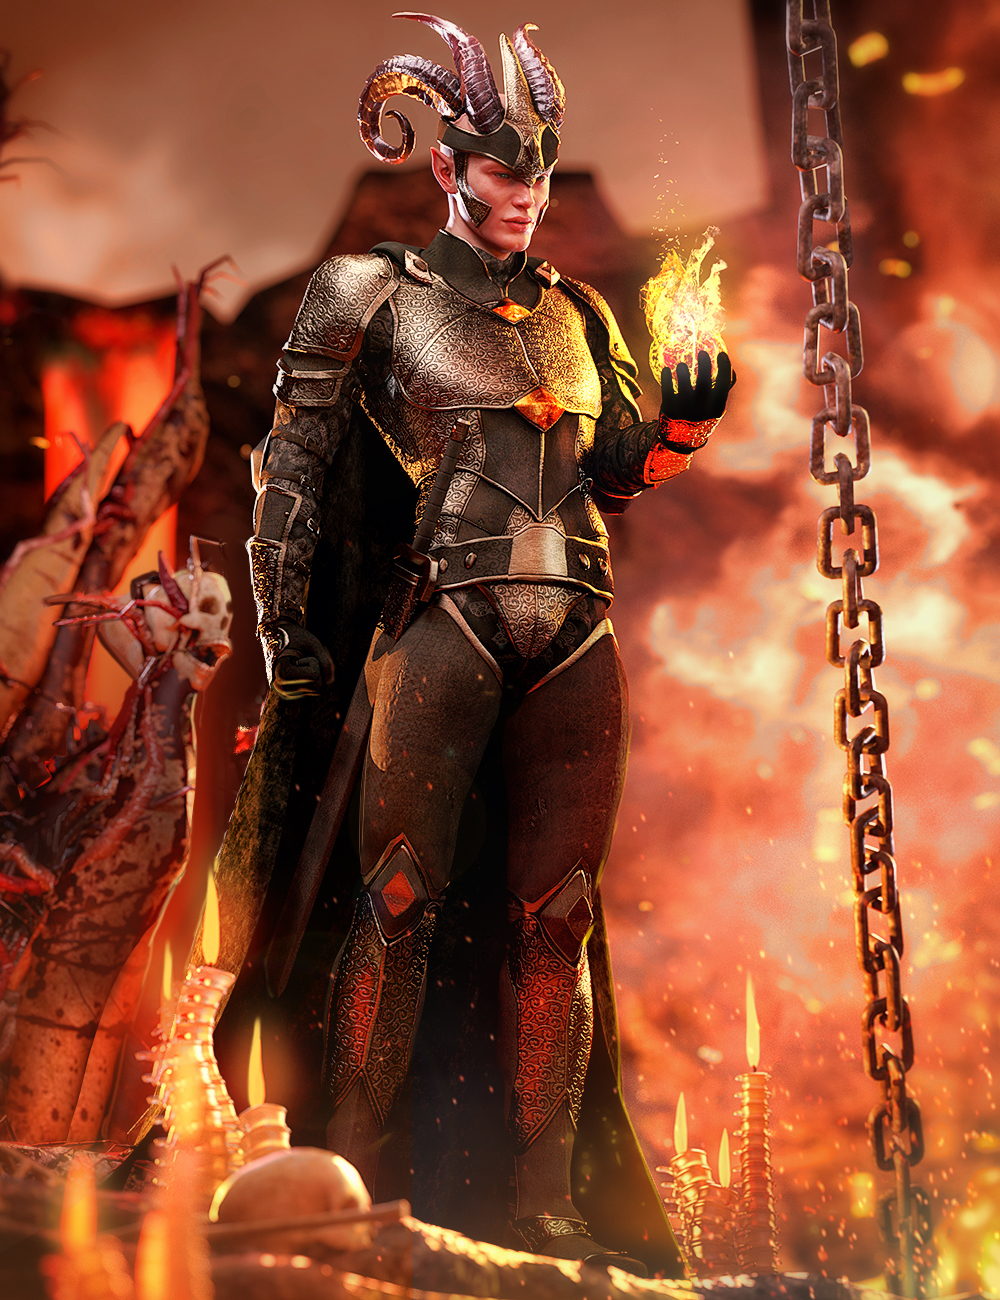 dForce Rage Armor for Genesis 8.1 Males by: Barbara BrundonUmblefuglyArien, 3D Models by Daz 3D